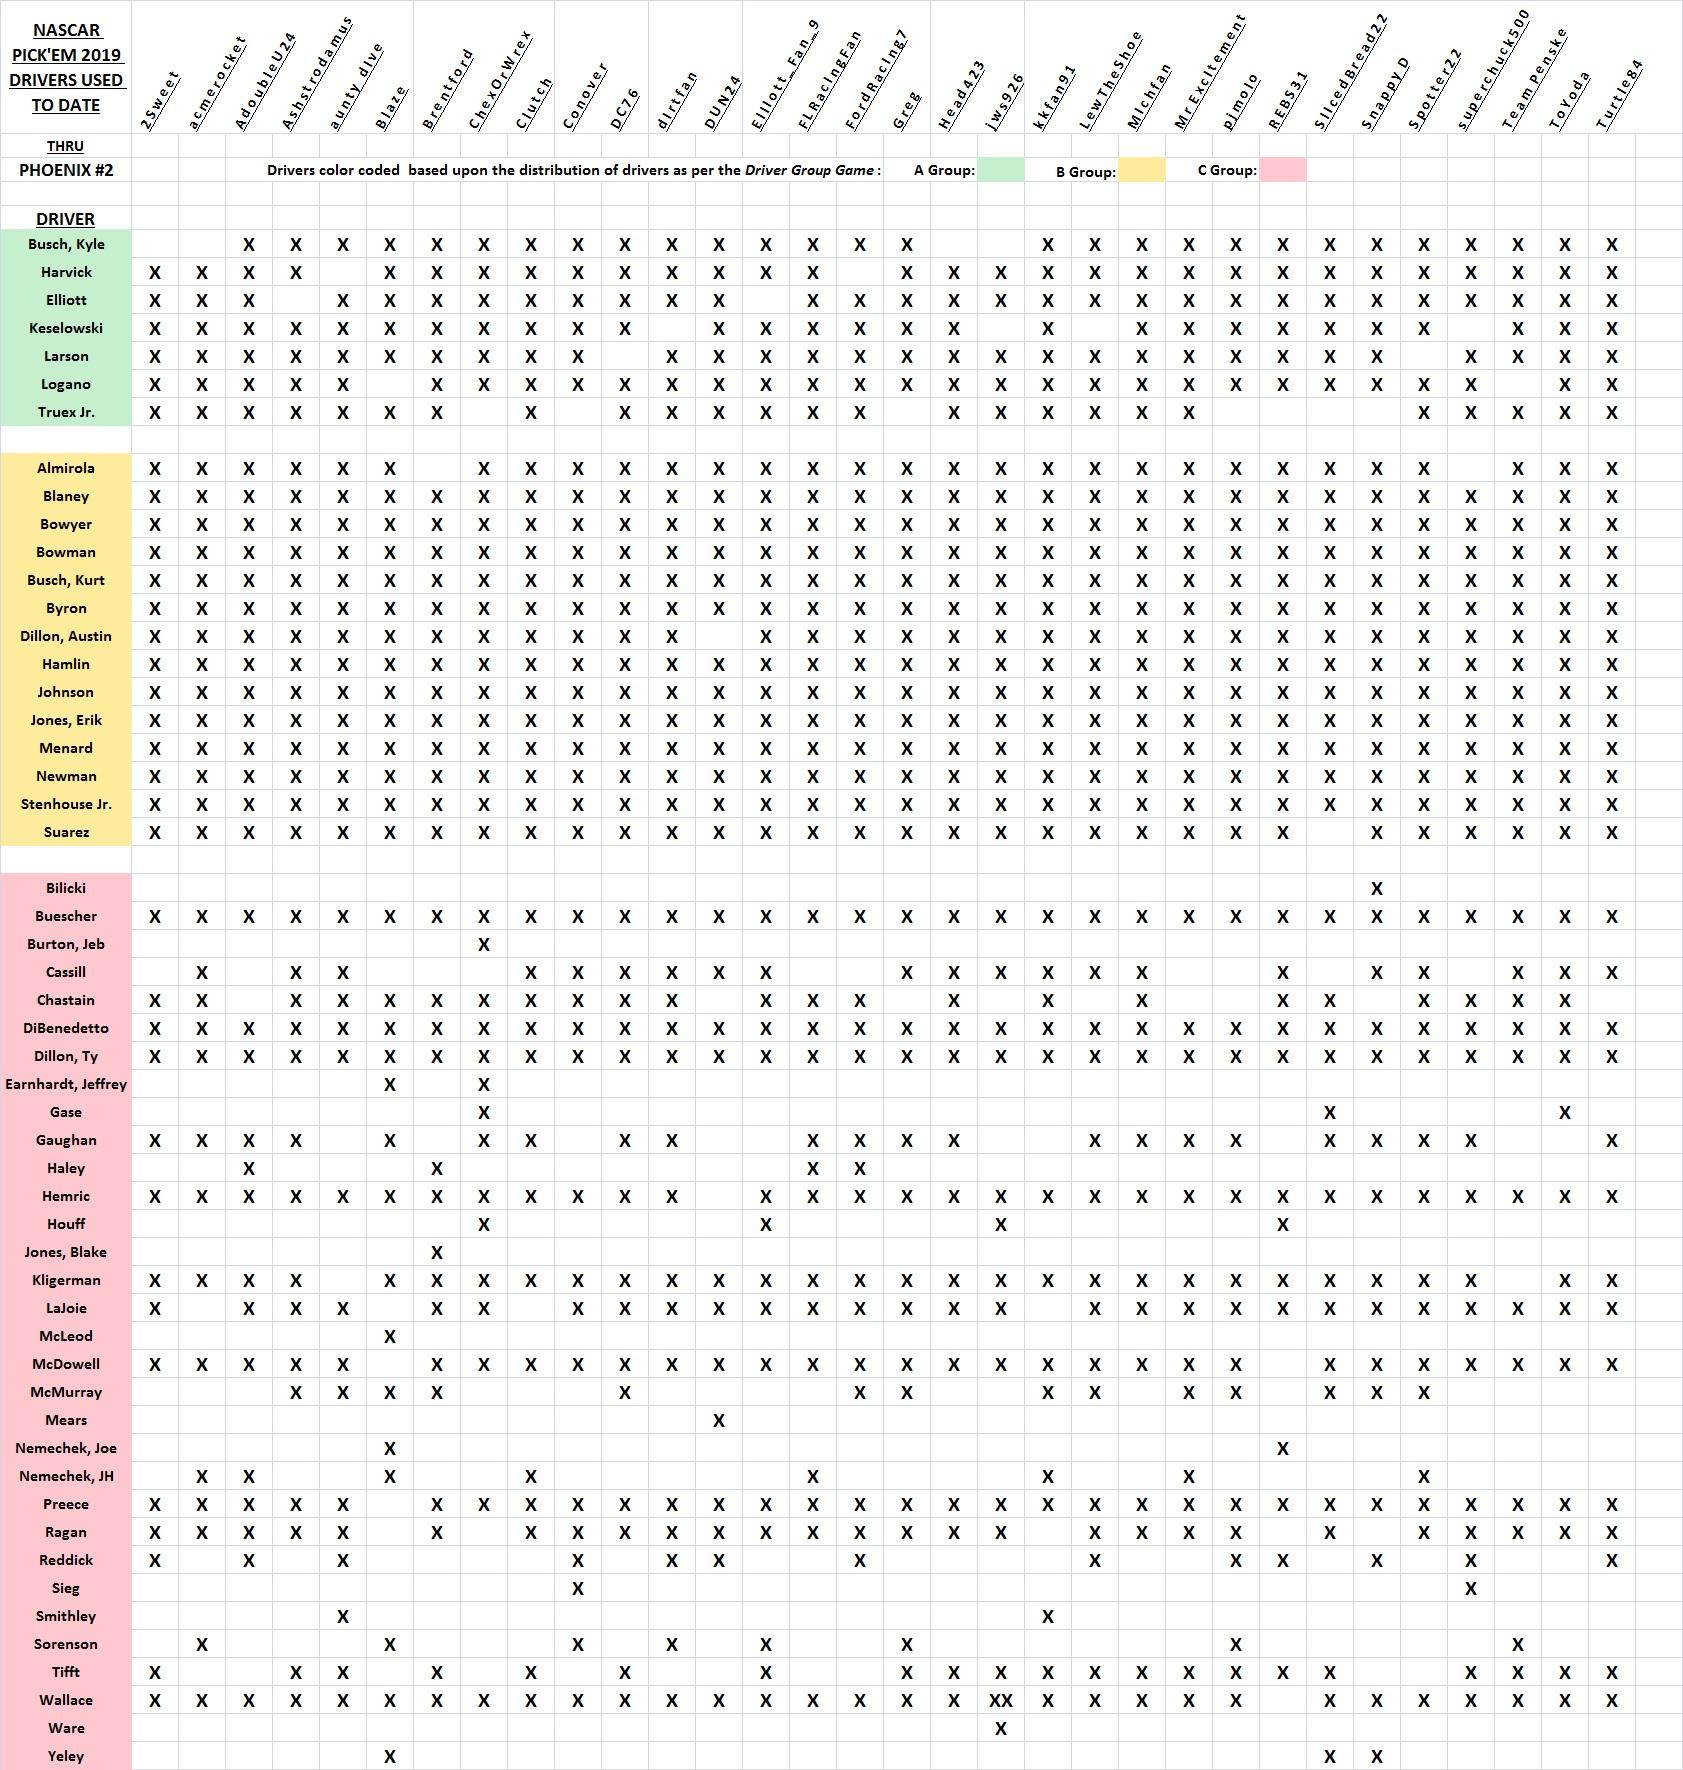 2019 drivers used - #35.jpg